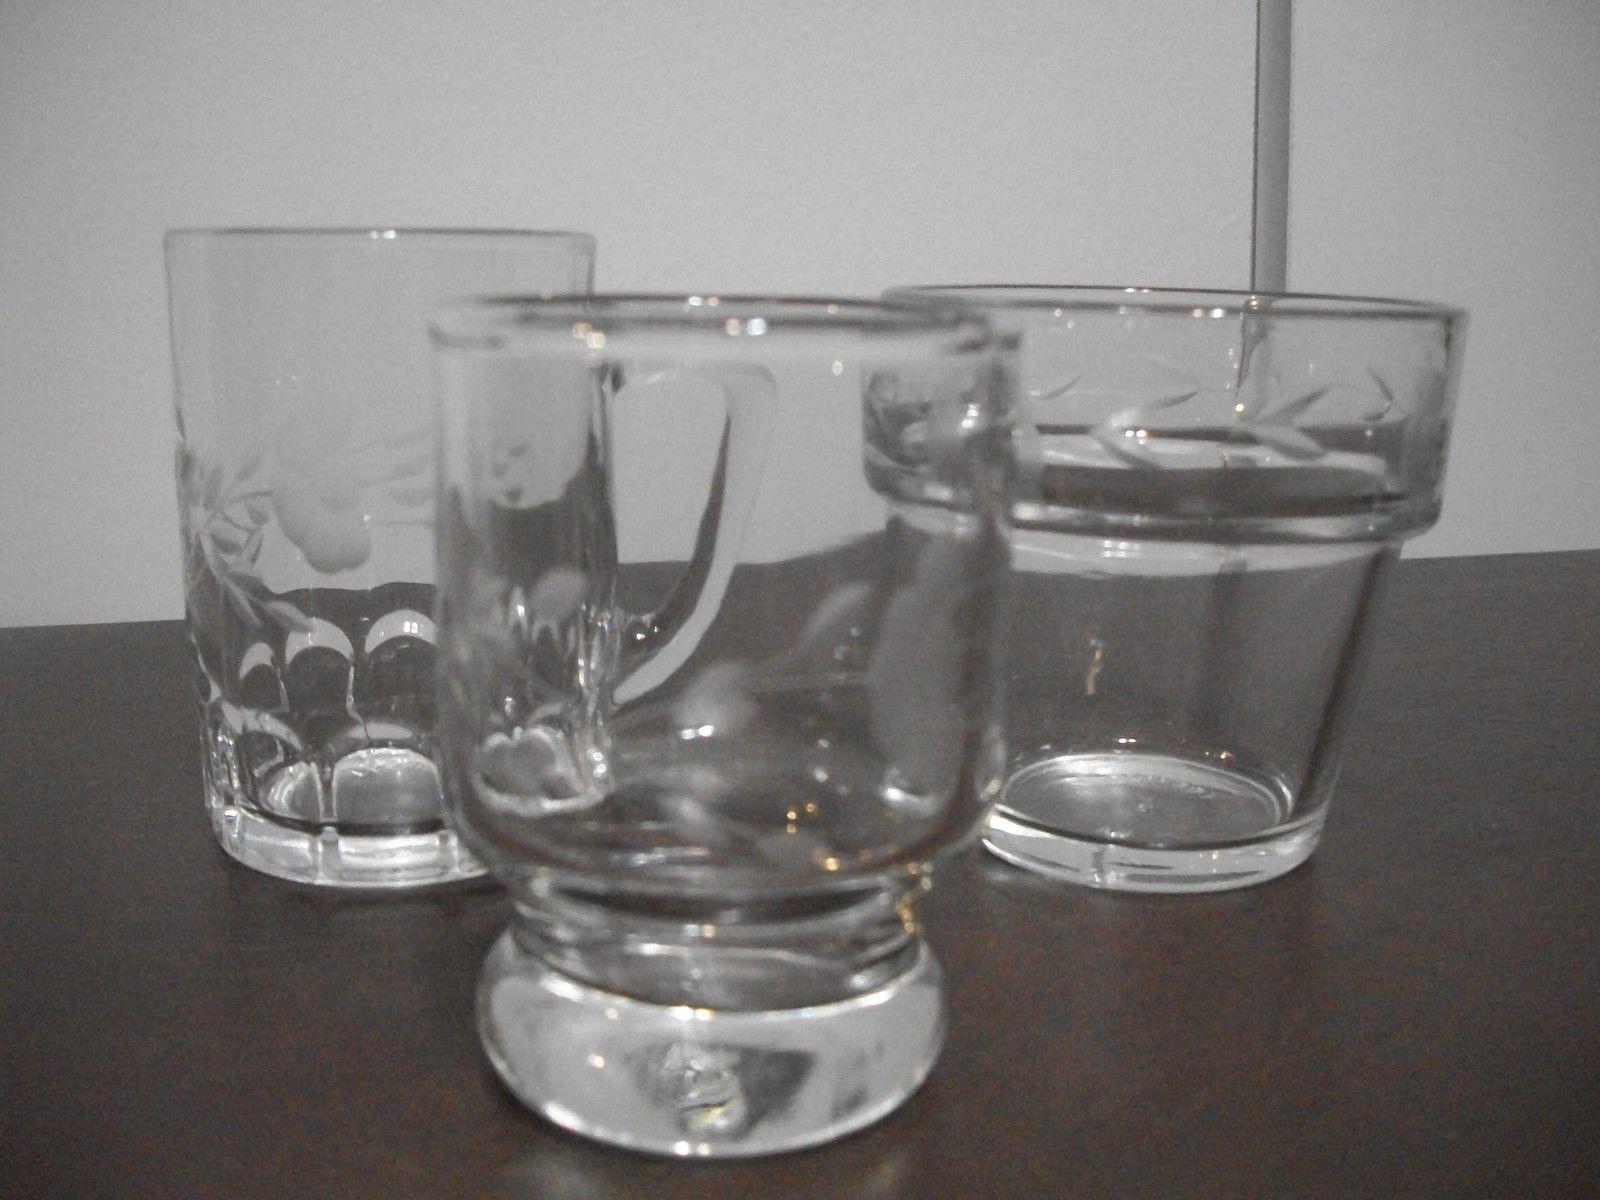 3  PRINCESS HOUSE HERITAGE MINI ITEMS PLANTER MUG GLASS